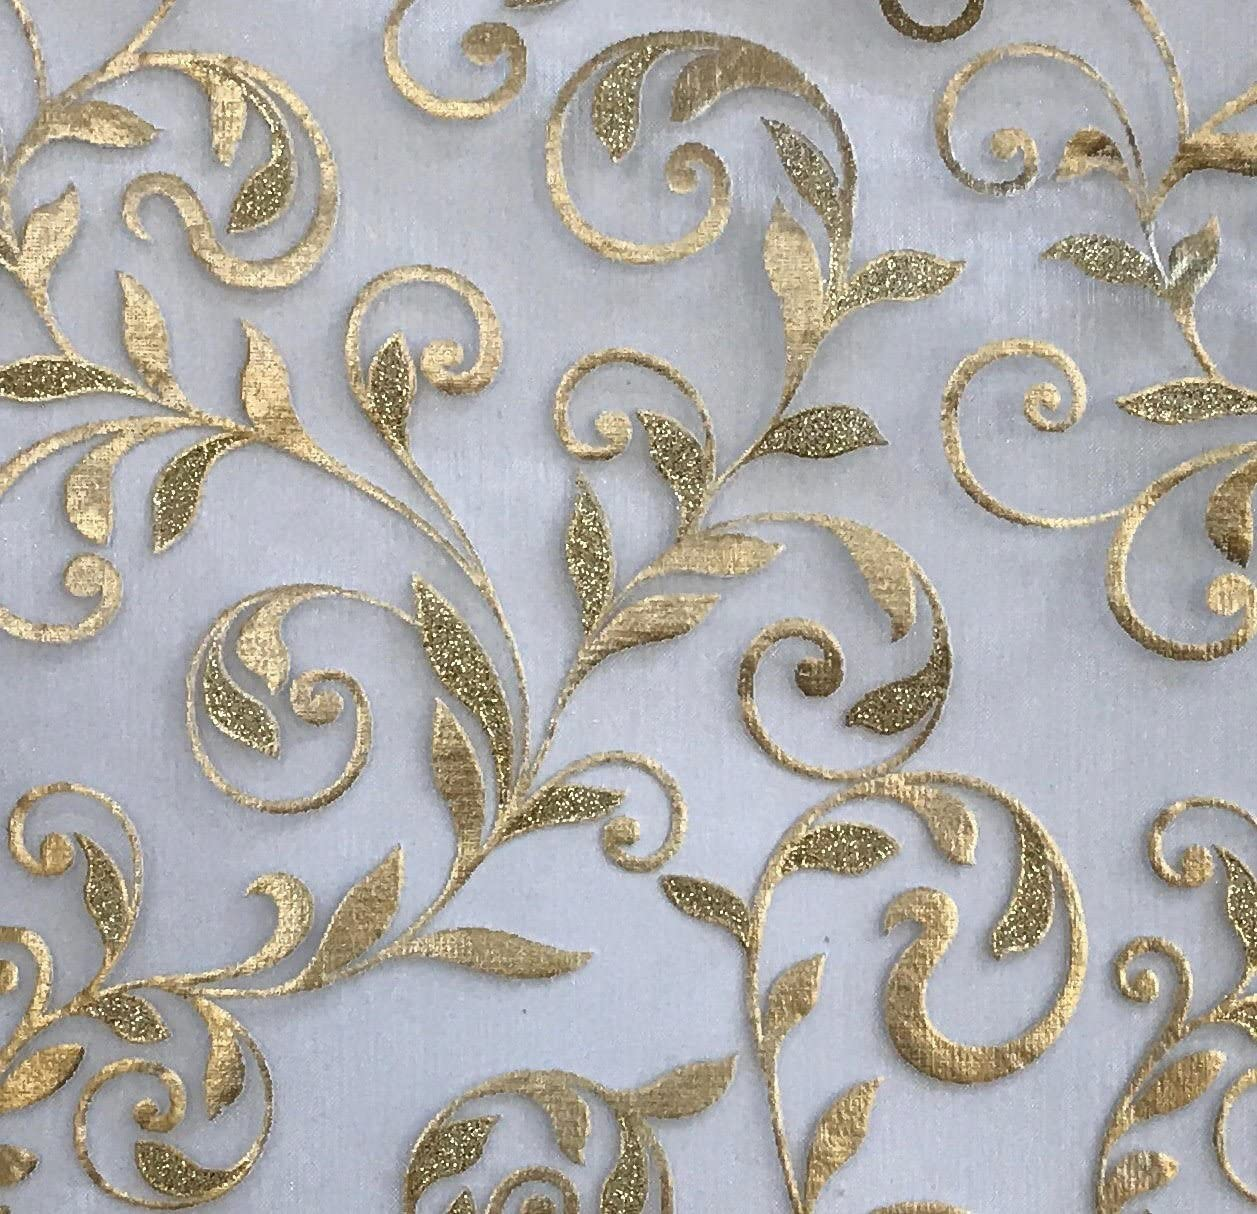 CurtainCityNewYork NY Metallic Floral Organza Sheer 6 Yards Scarf Valance Gold, 216L X 50W